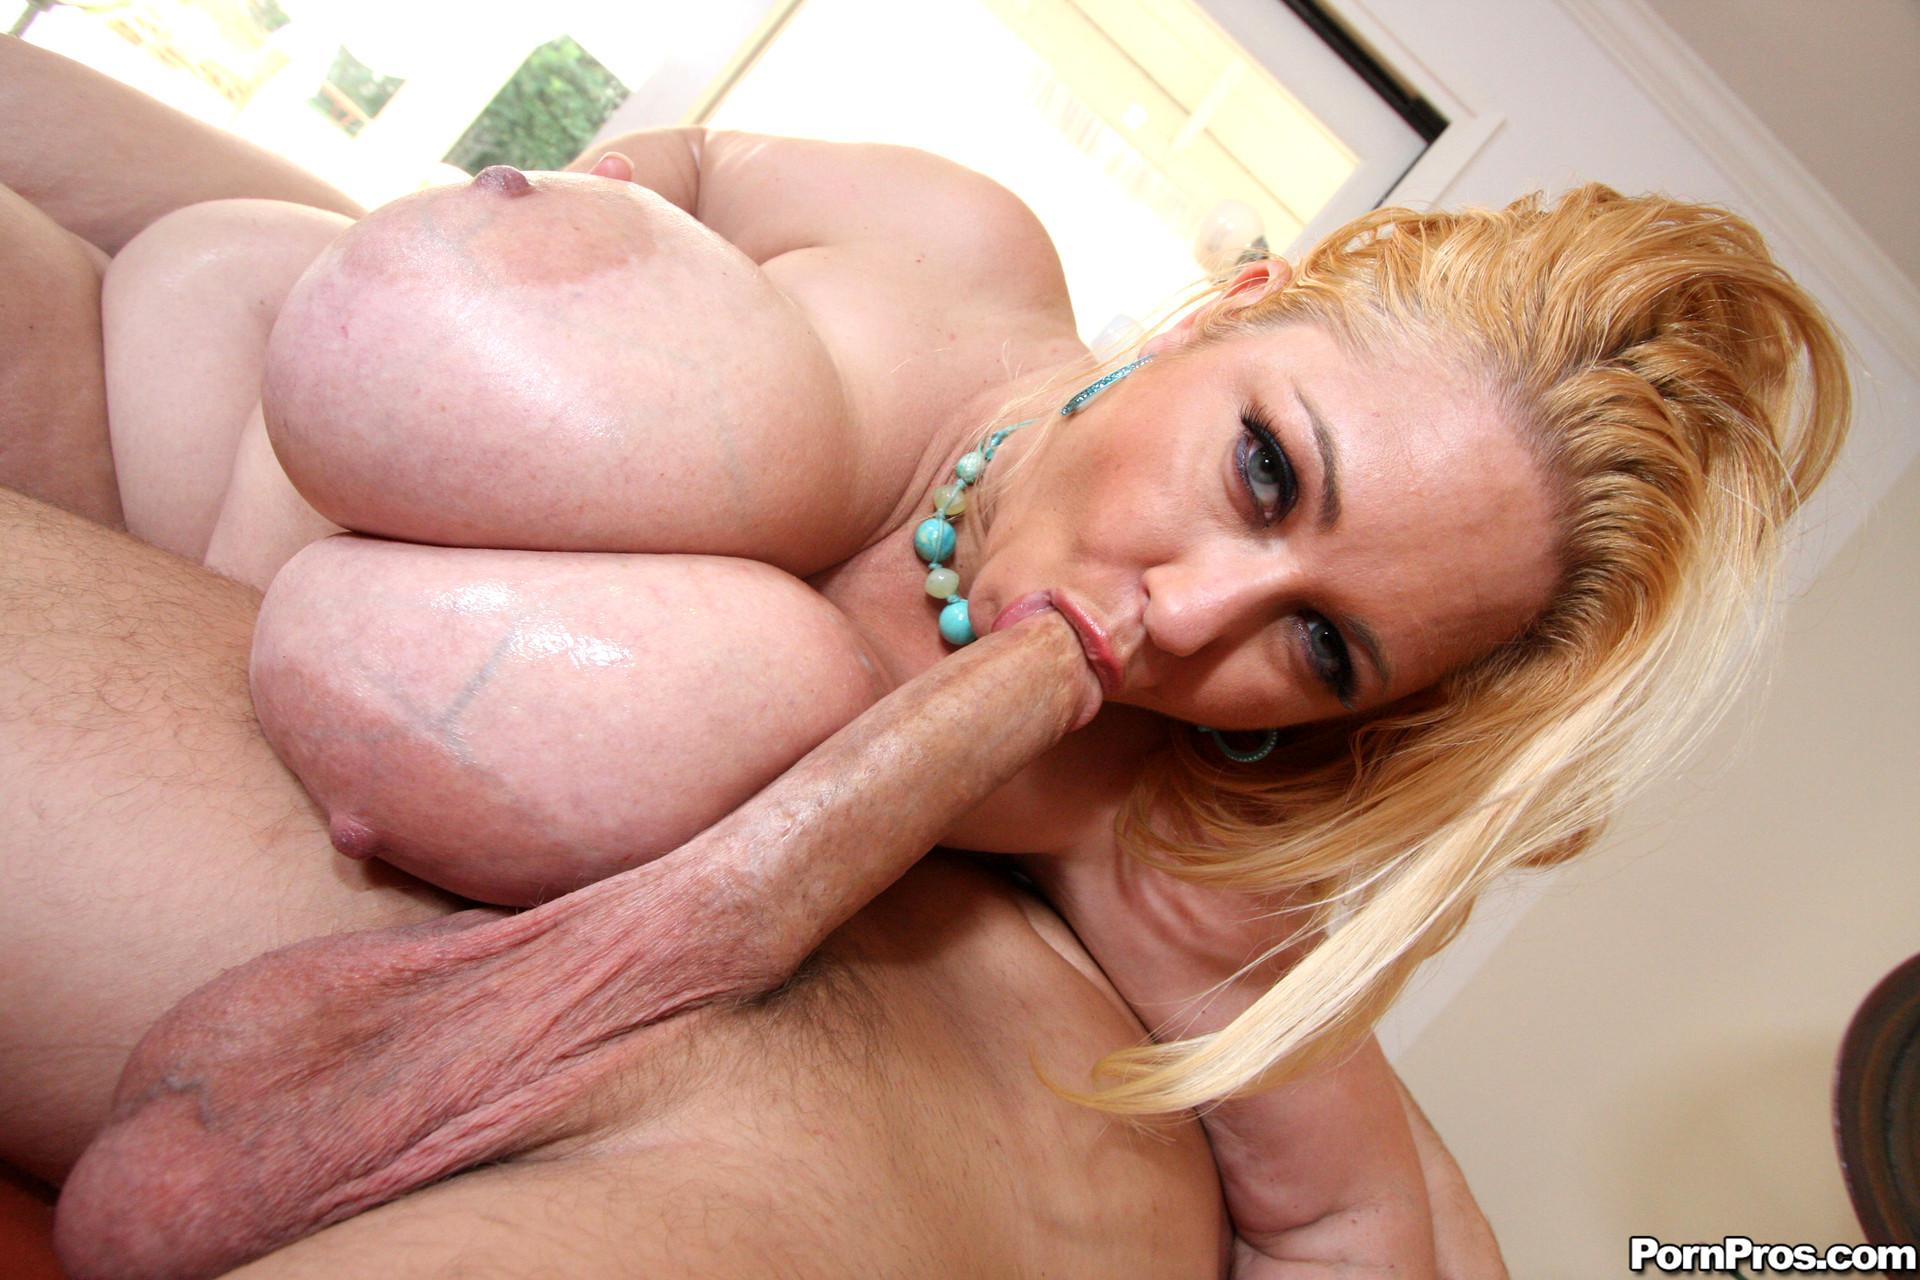 Kianna dior fucks the big cock with her huge tits in pov